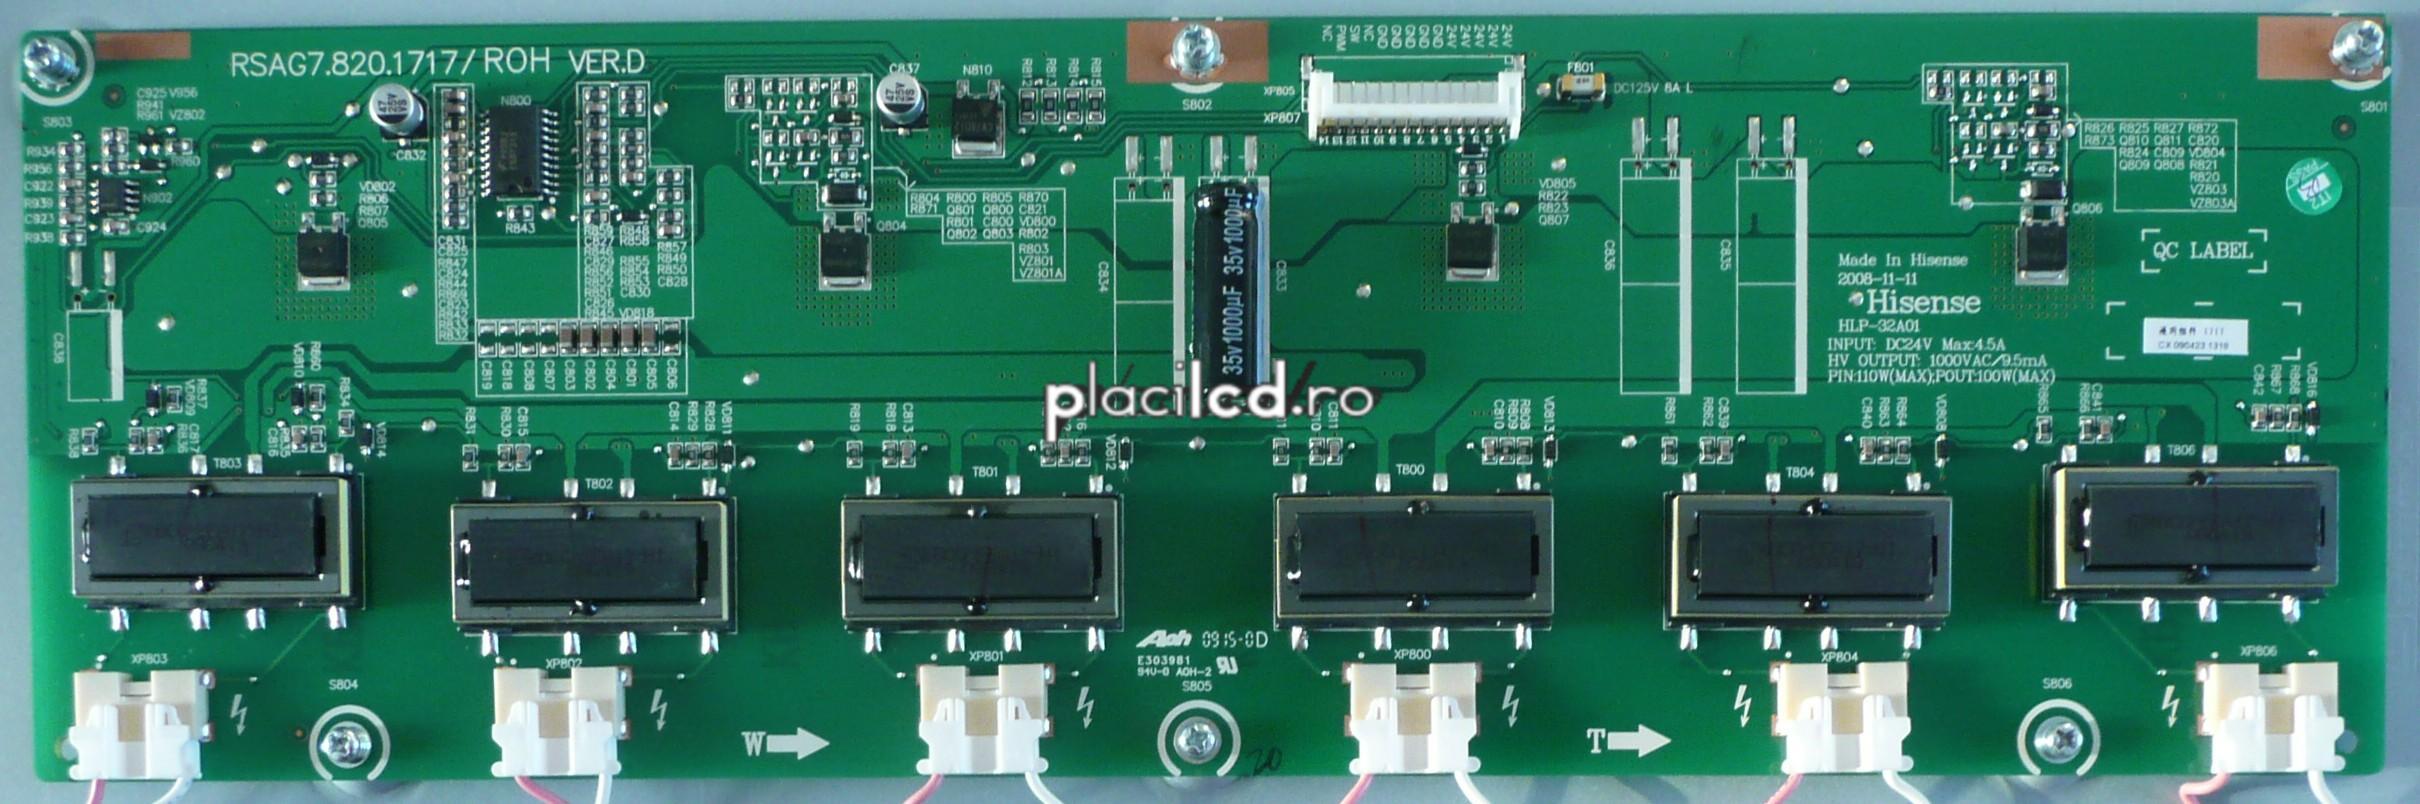 Placa invertoare HLP-32A01